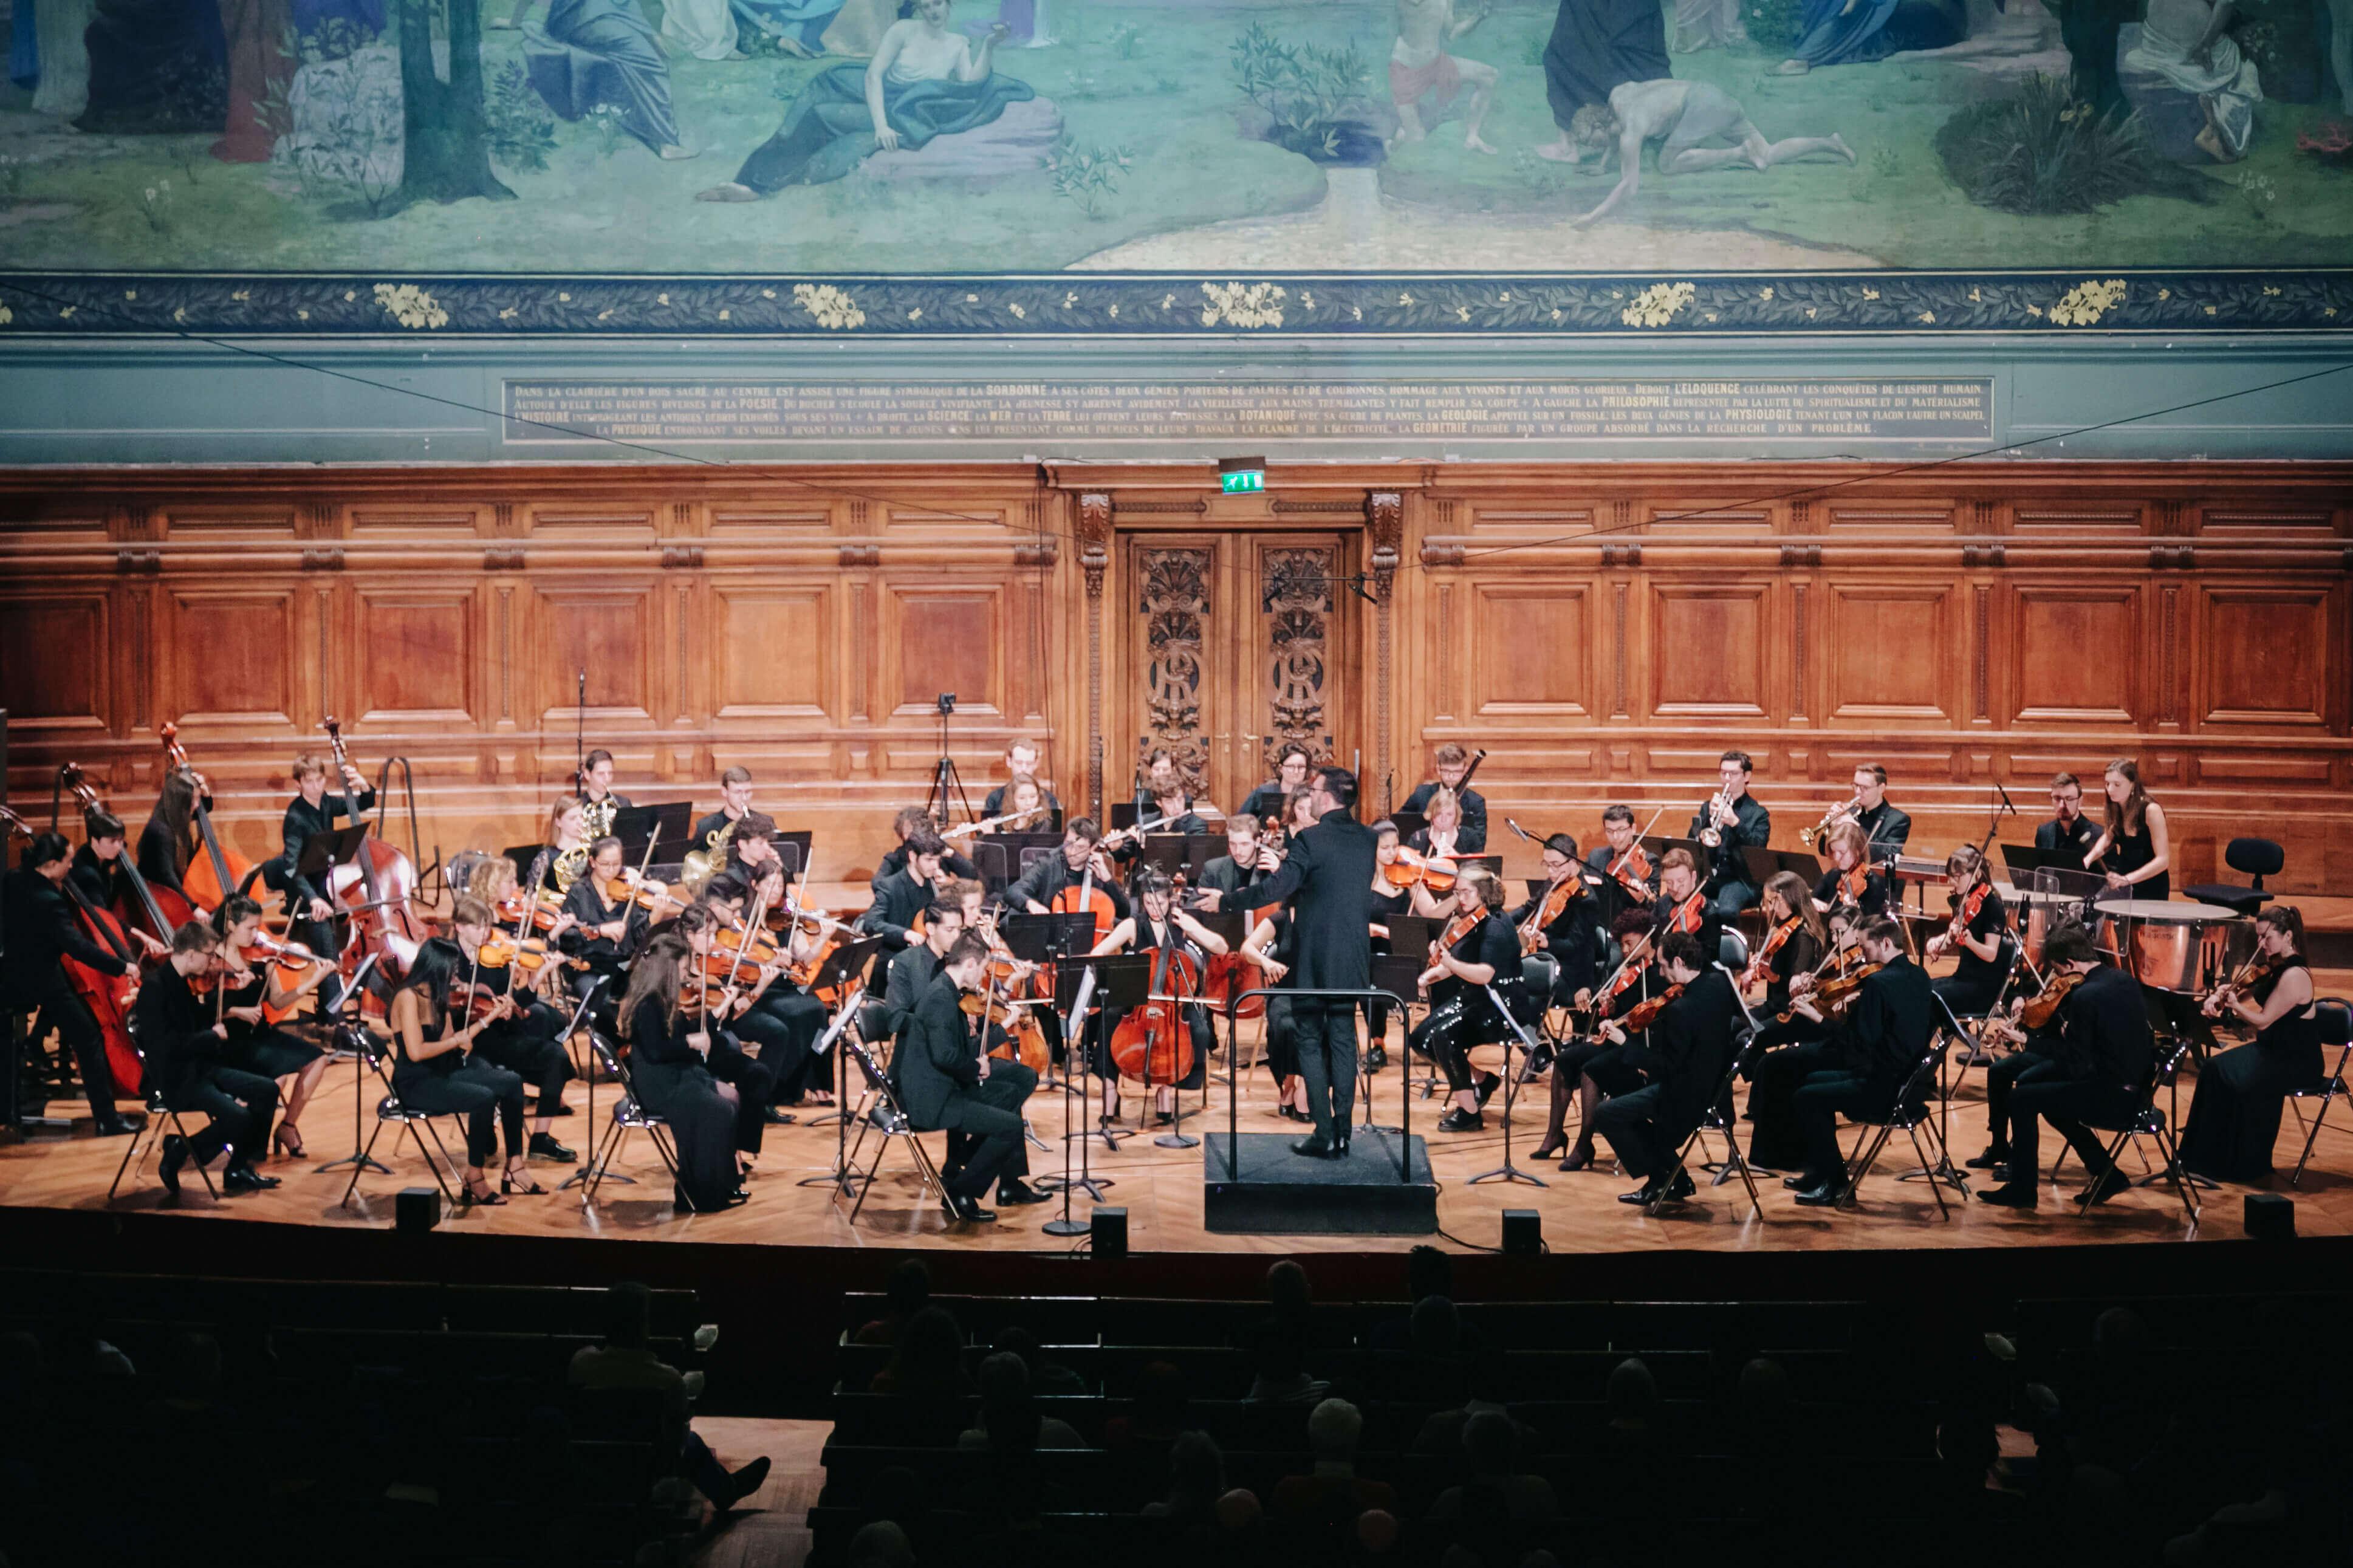 Orchestra Radio Zeta Calendario.2019 Florence Youth Festival